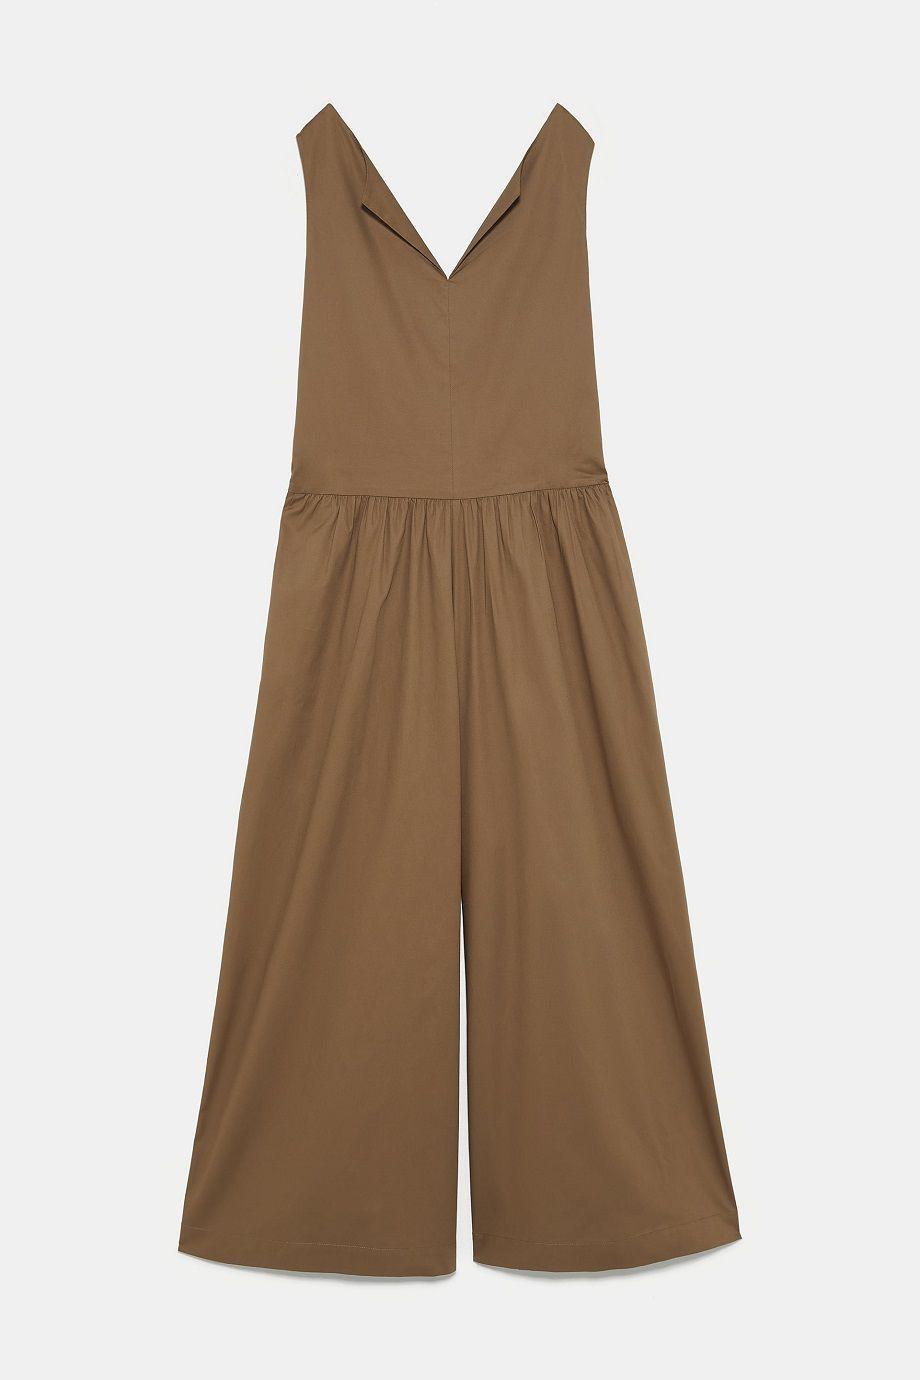 #PopbelaOOTD: Tampil Catchy dengan 5 Fashion Item Ini!